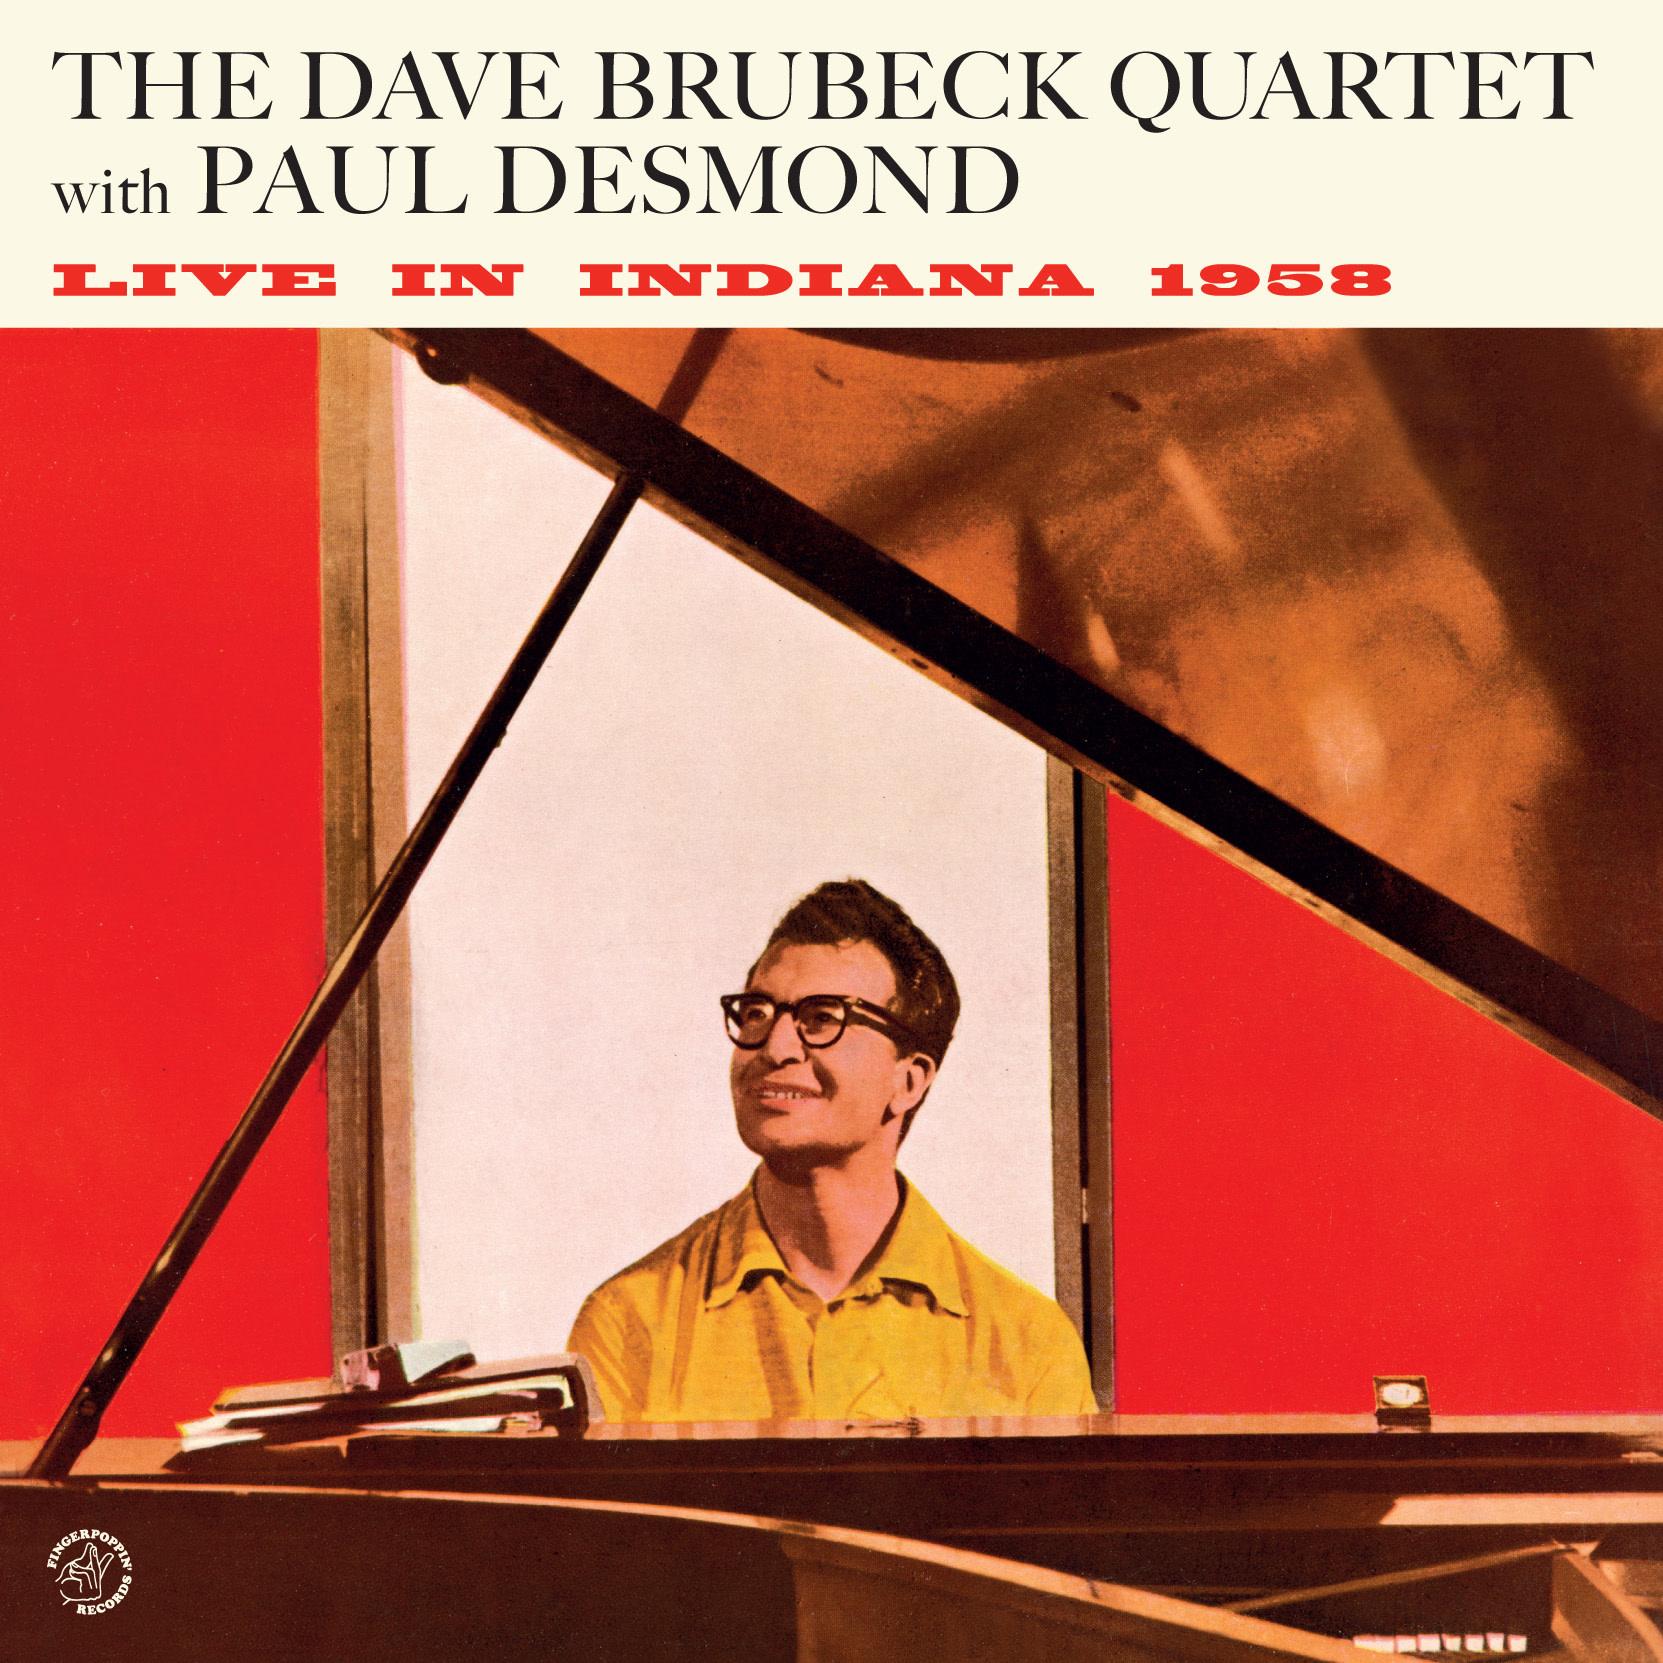 Fingerpoppin' Records Dave Brubeck Quartet & Paul Desmond - Live In Indiana 1958